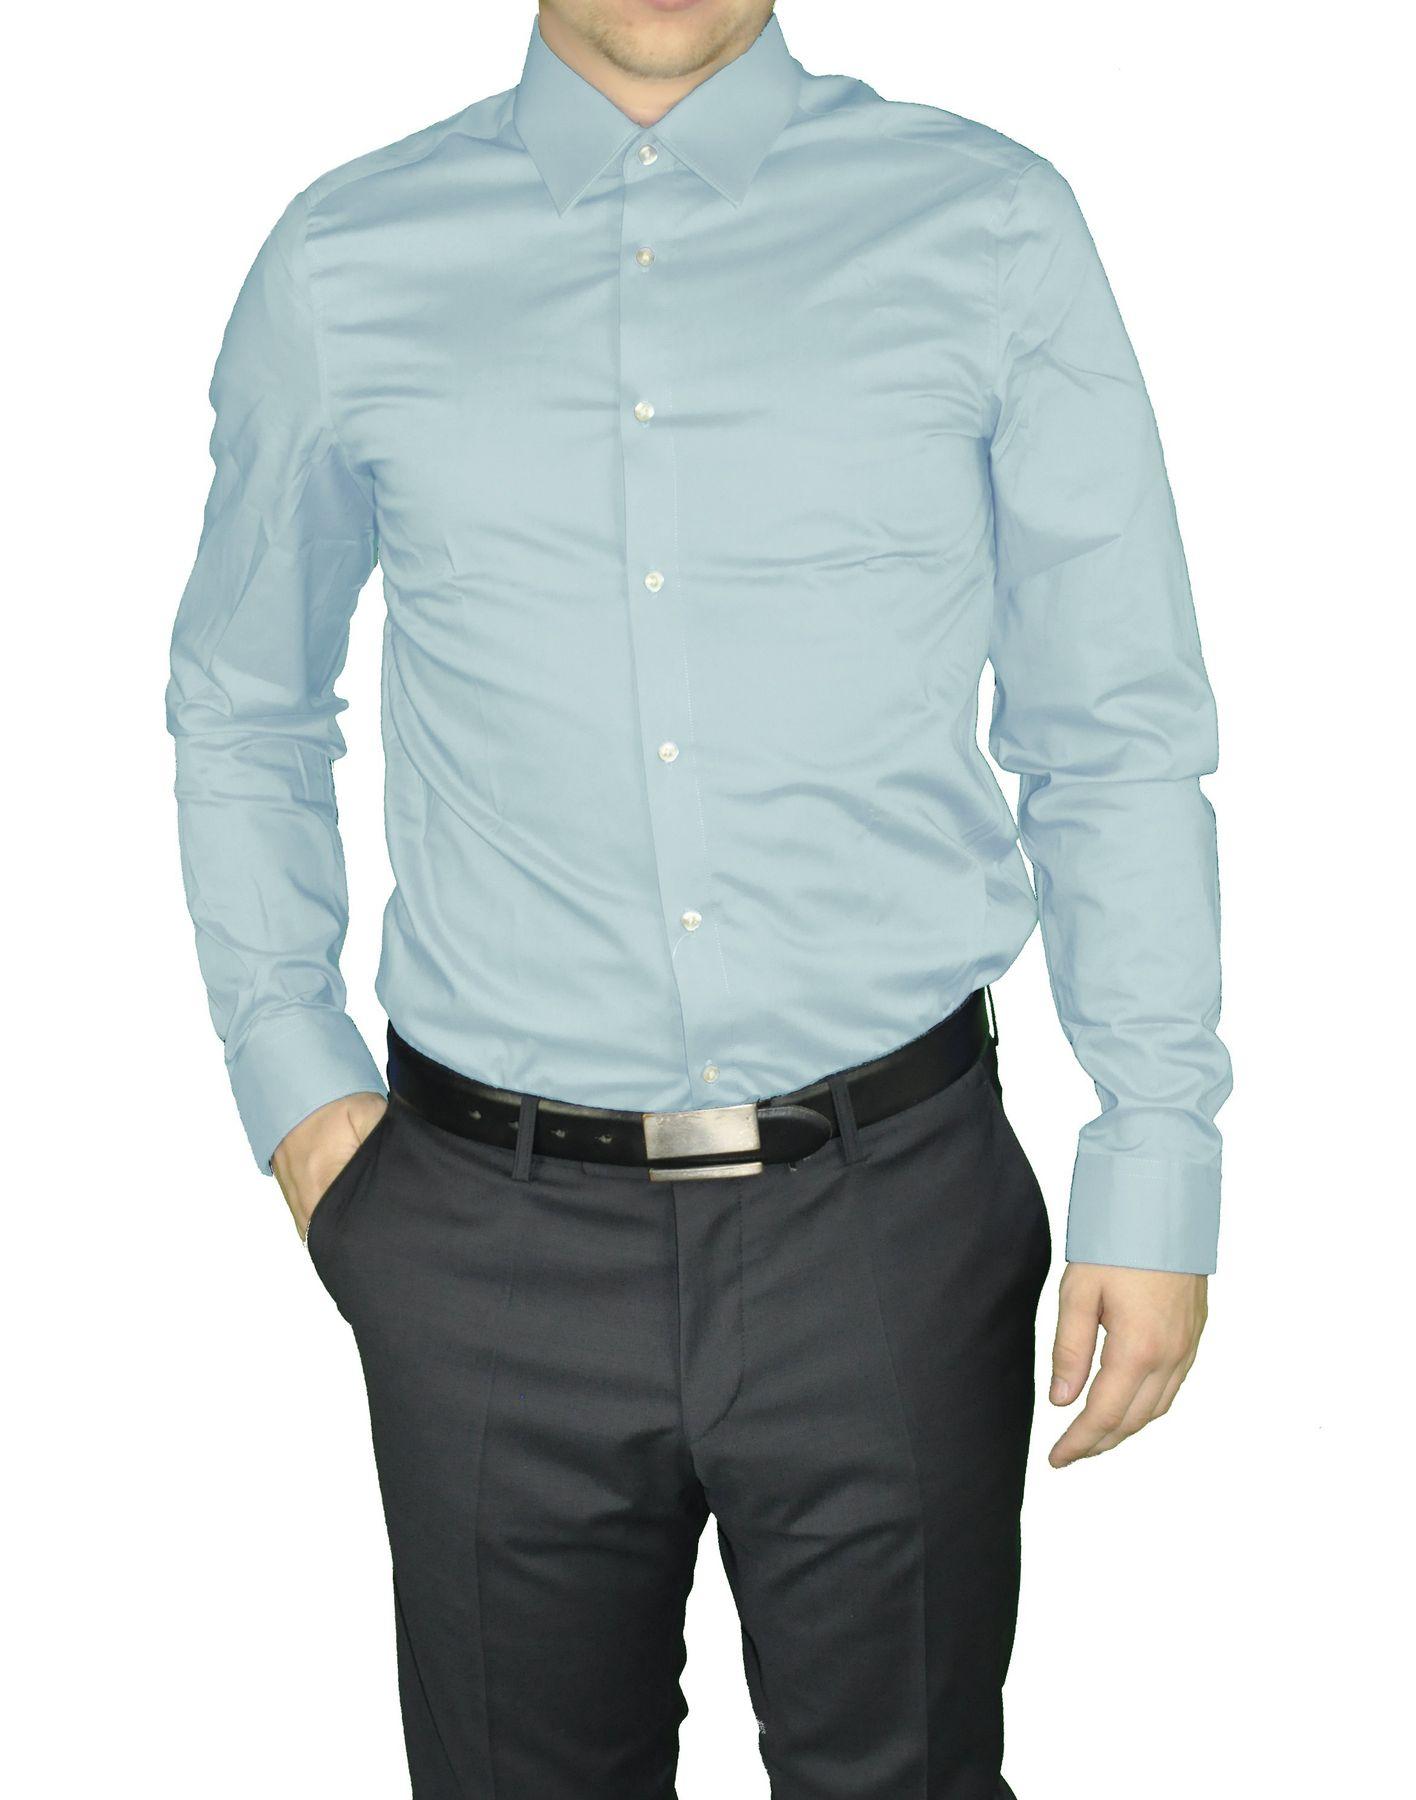 Redmond - Herren Slim Fit Hemd in verschiedenen Farben (400130/17A) – Bild 1